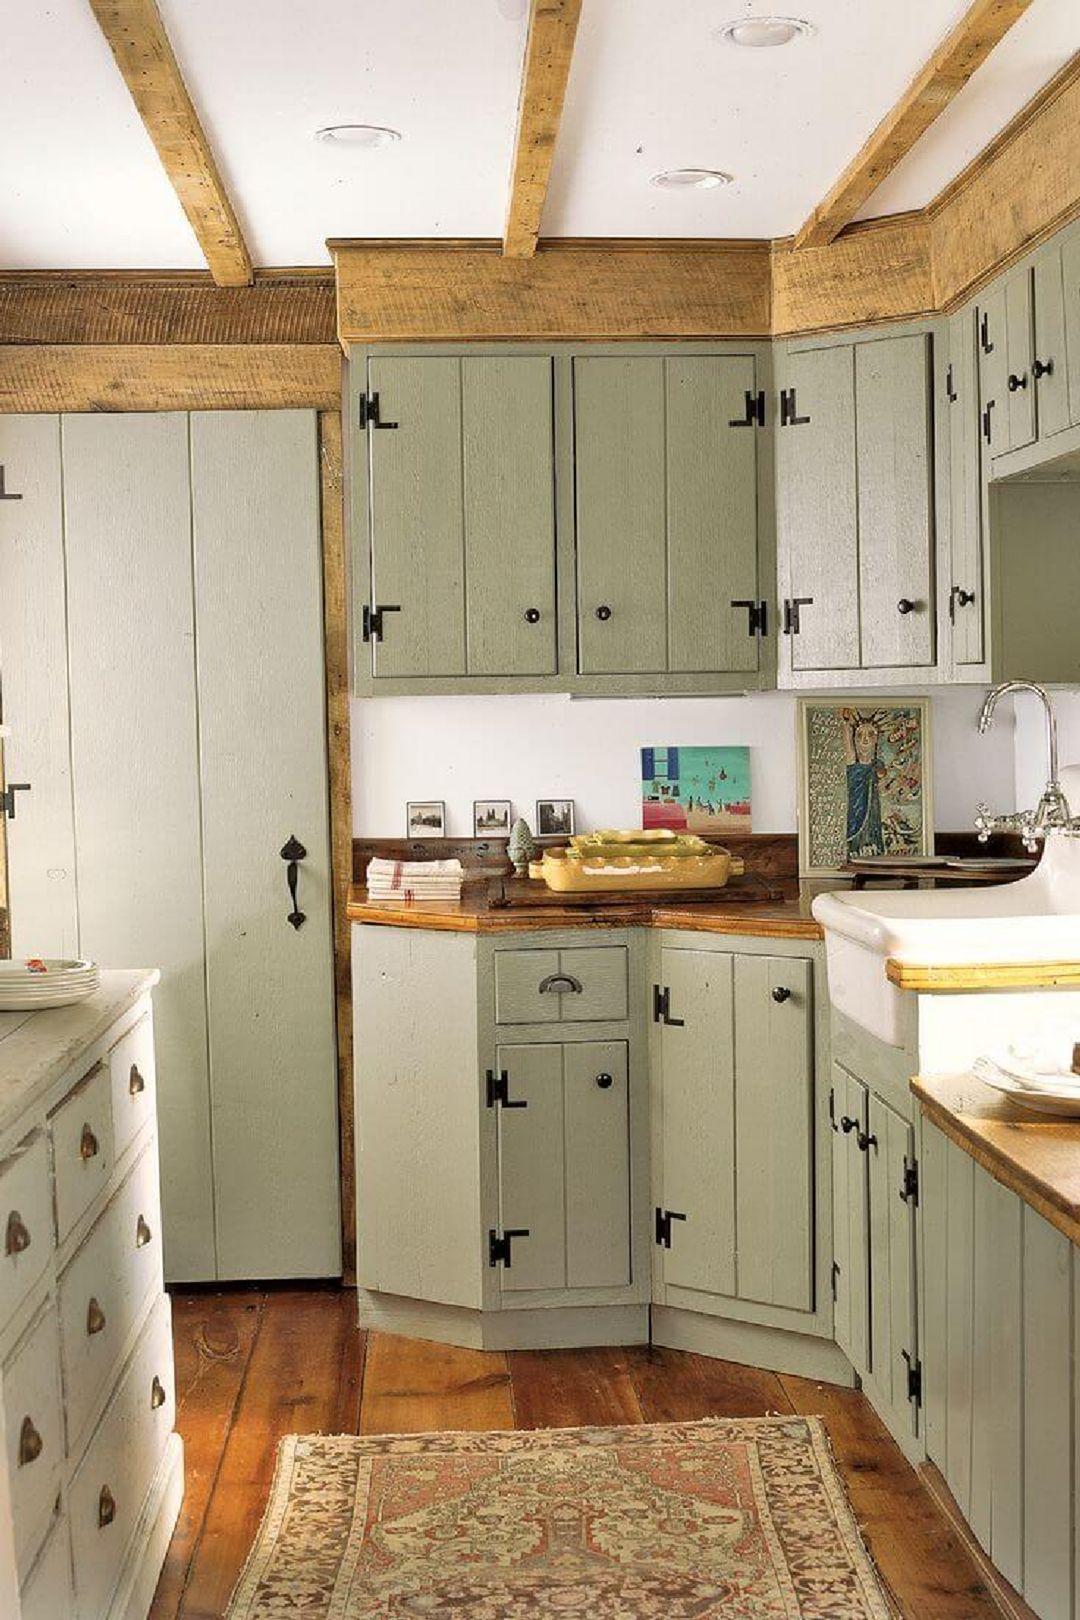 13 Wonderful Farmhouse Kitchen Decorating Ideas for You Try #farmhousekitchencolors